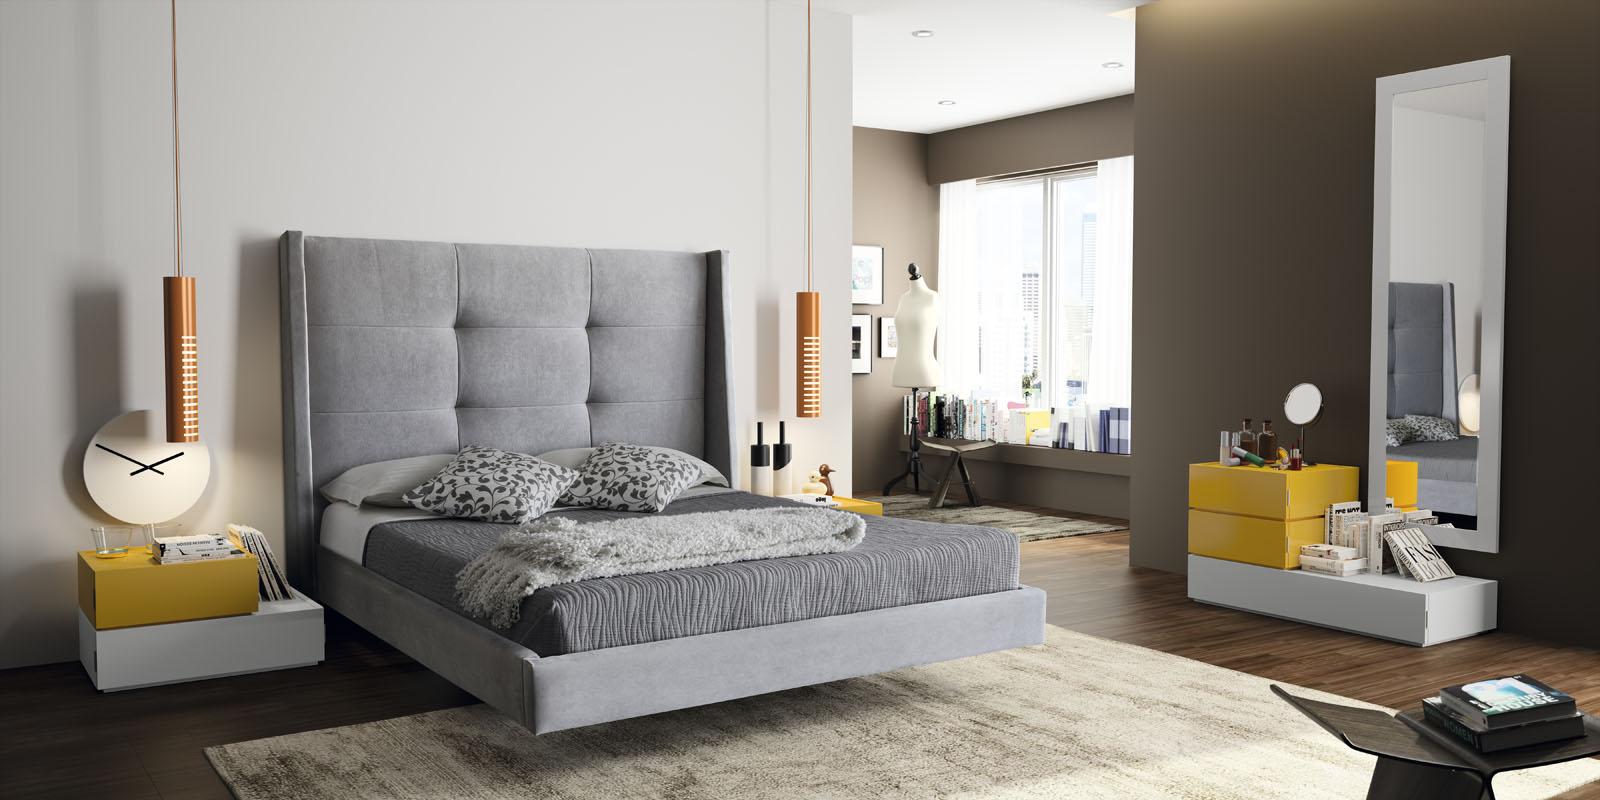 Miegamojo-baldai-dvigules-lovos-spintos